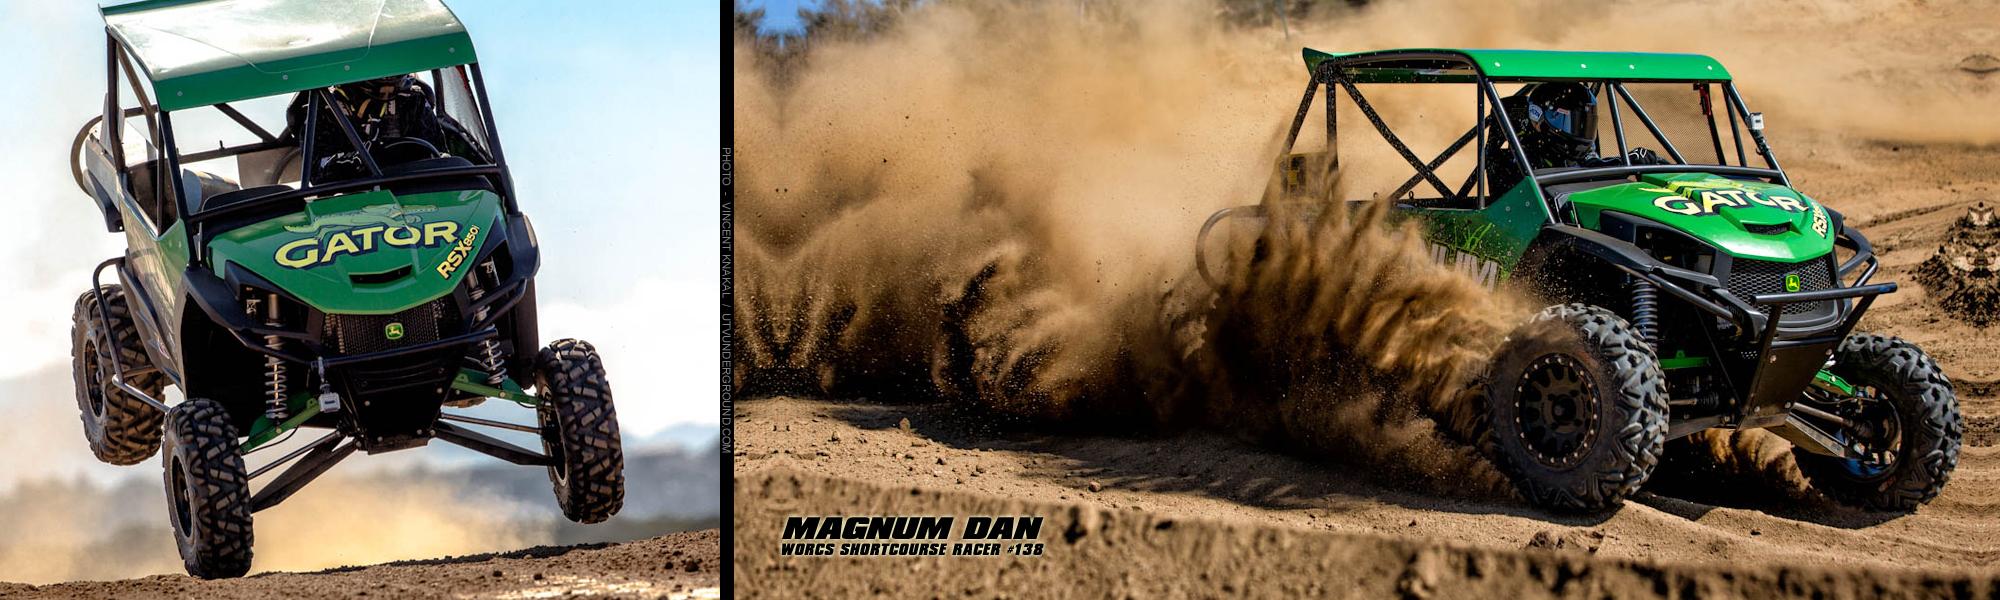 Magnum Offroad John Deere Gator RSX 850